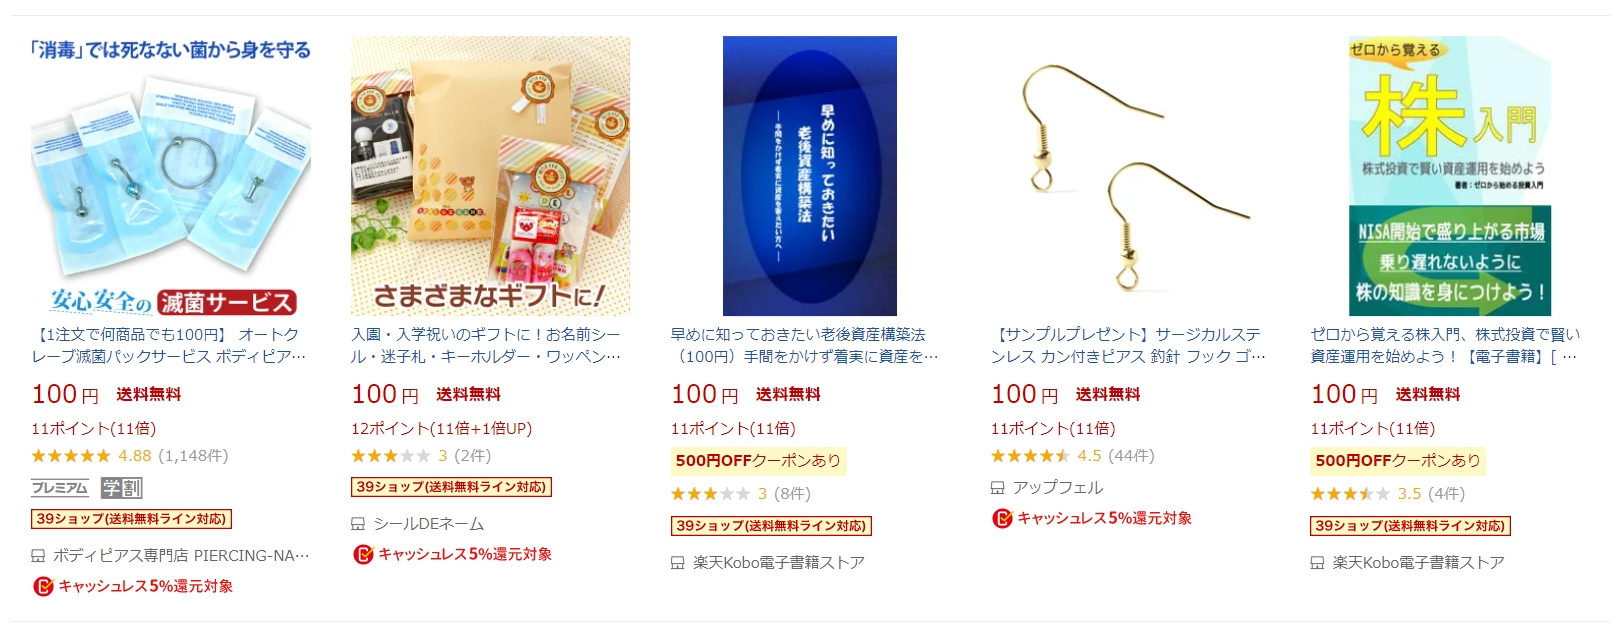 楽天の100円送料無料の商品たち